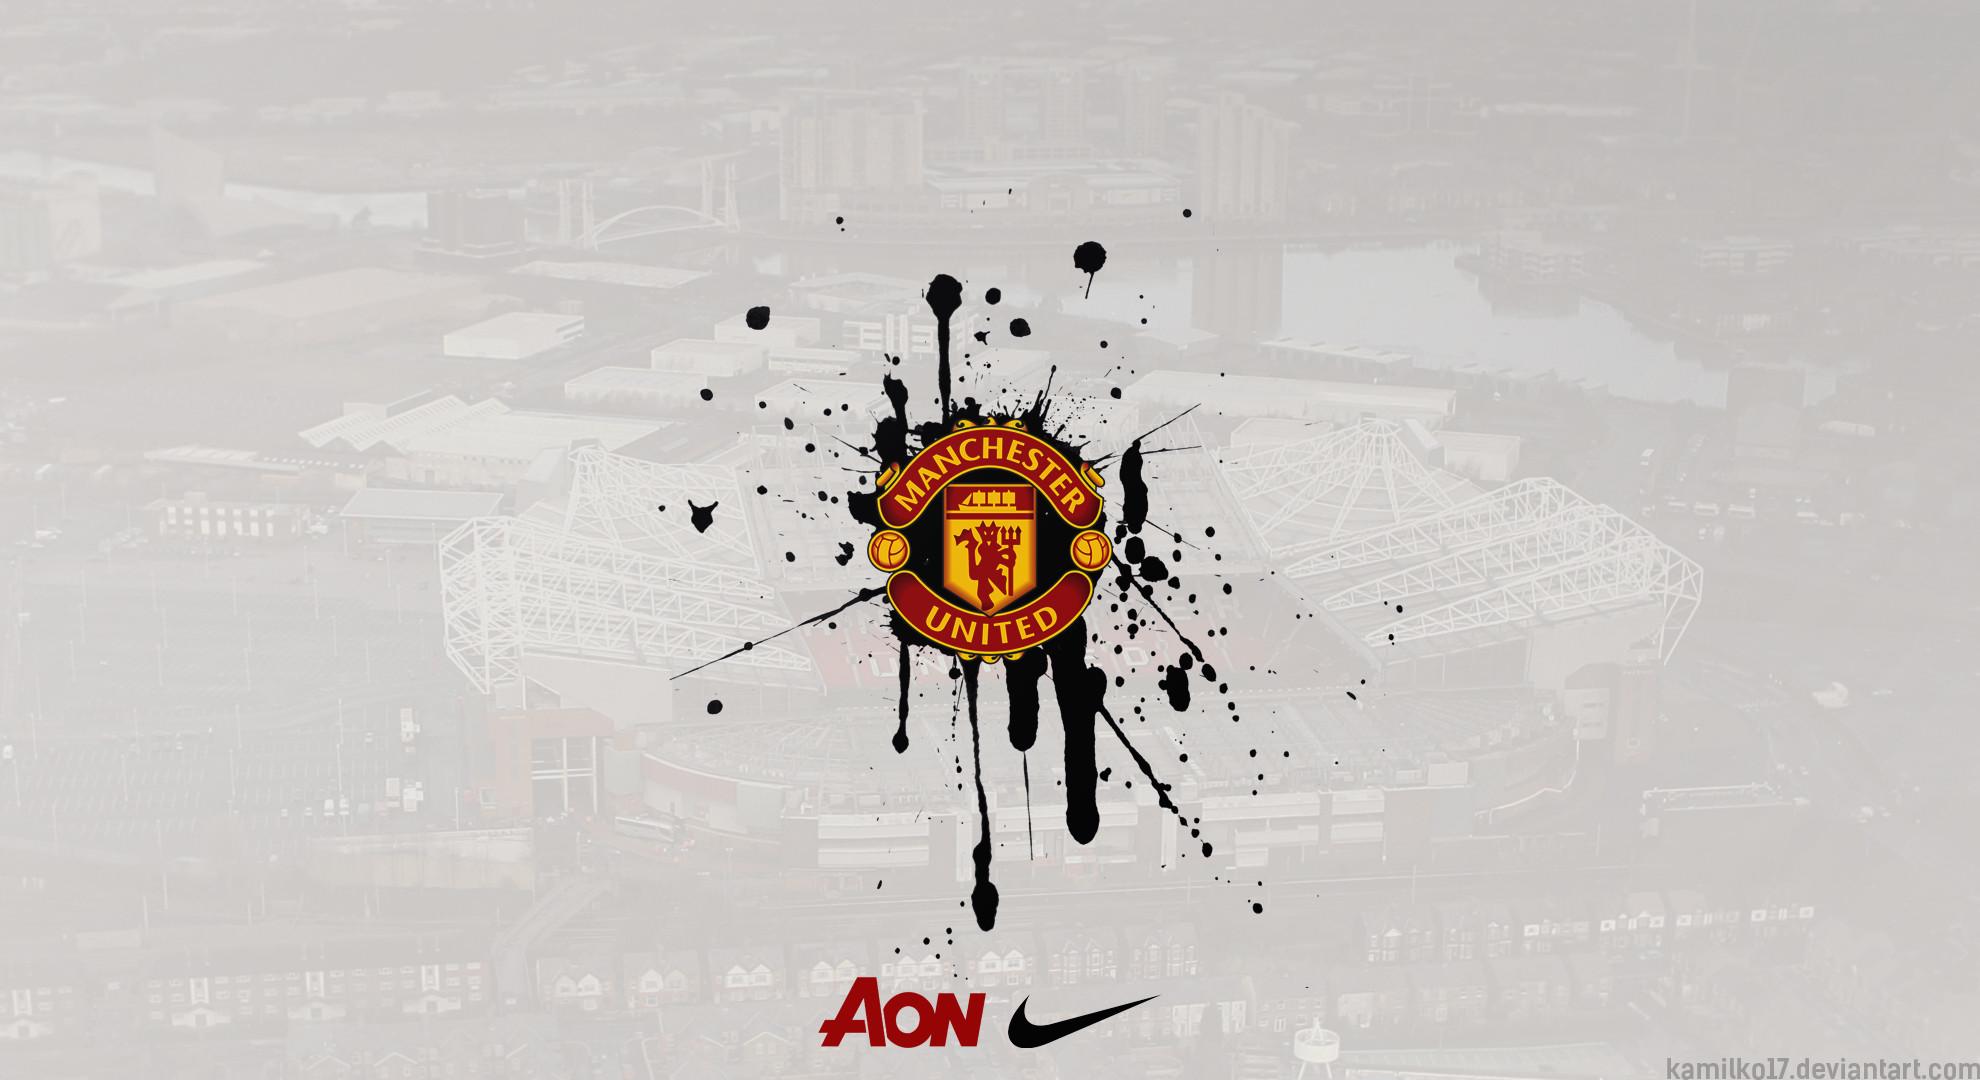 Manchester united logo wallpaper hd download voltagebd Choice Image